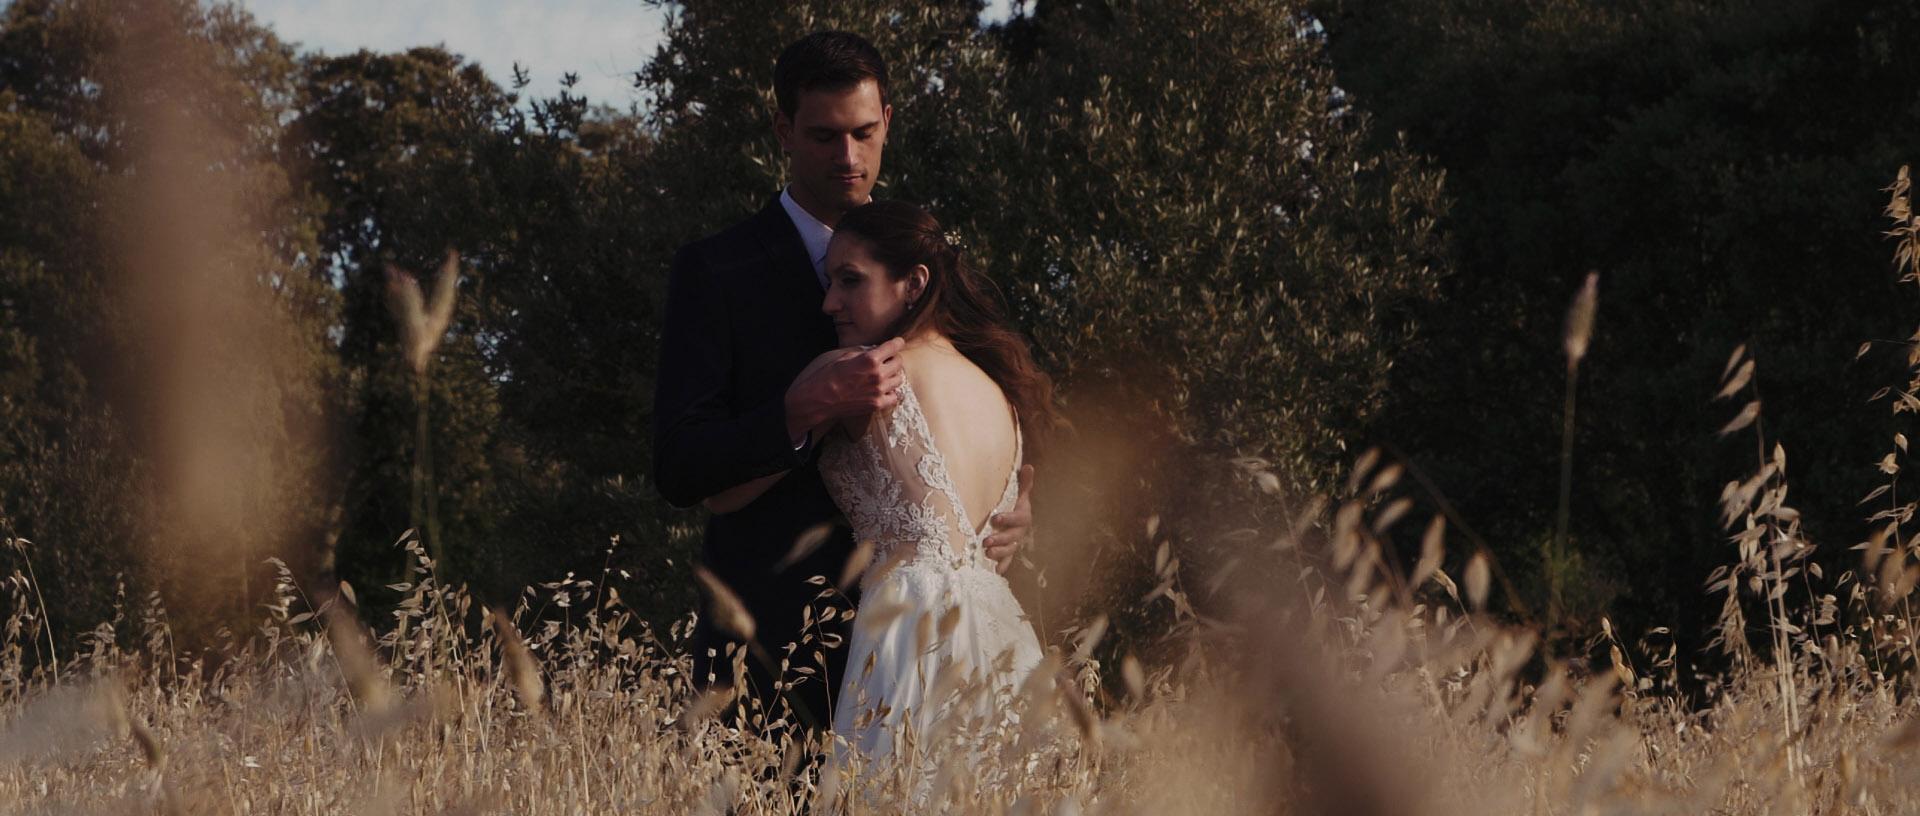 Carolina & Francisco - Wedding